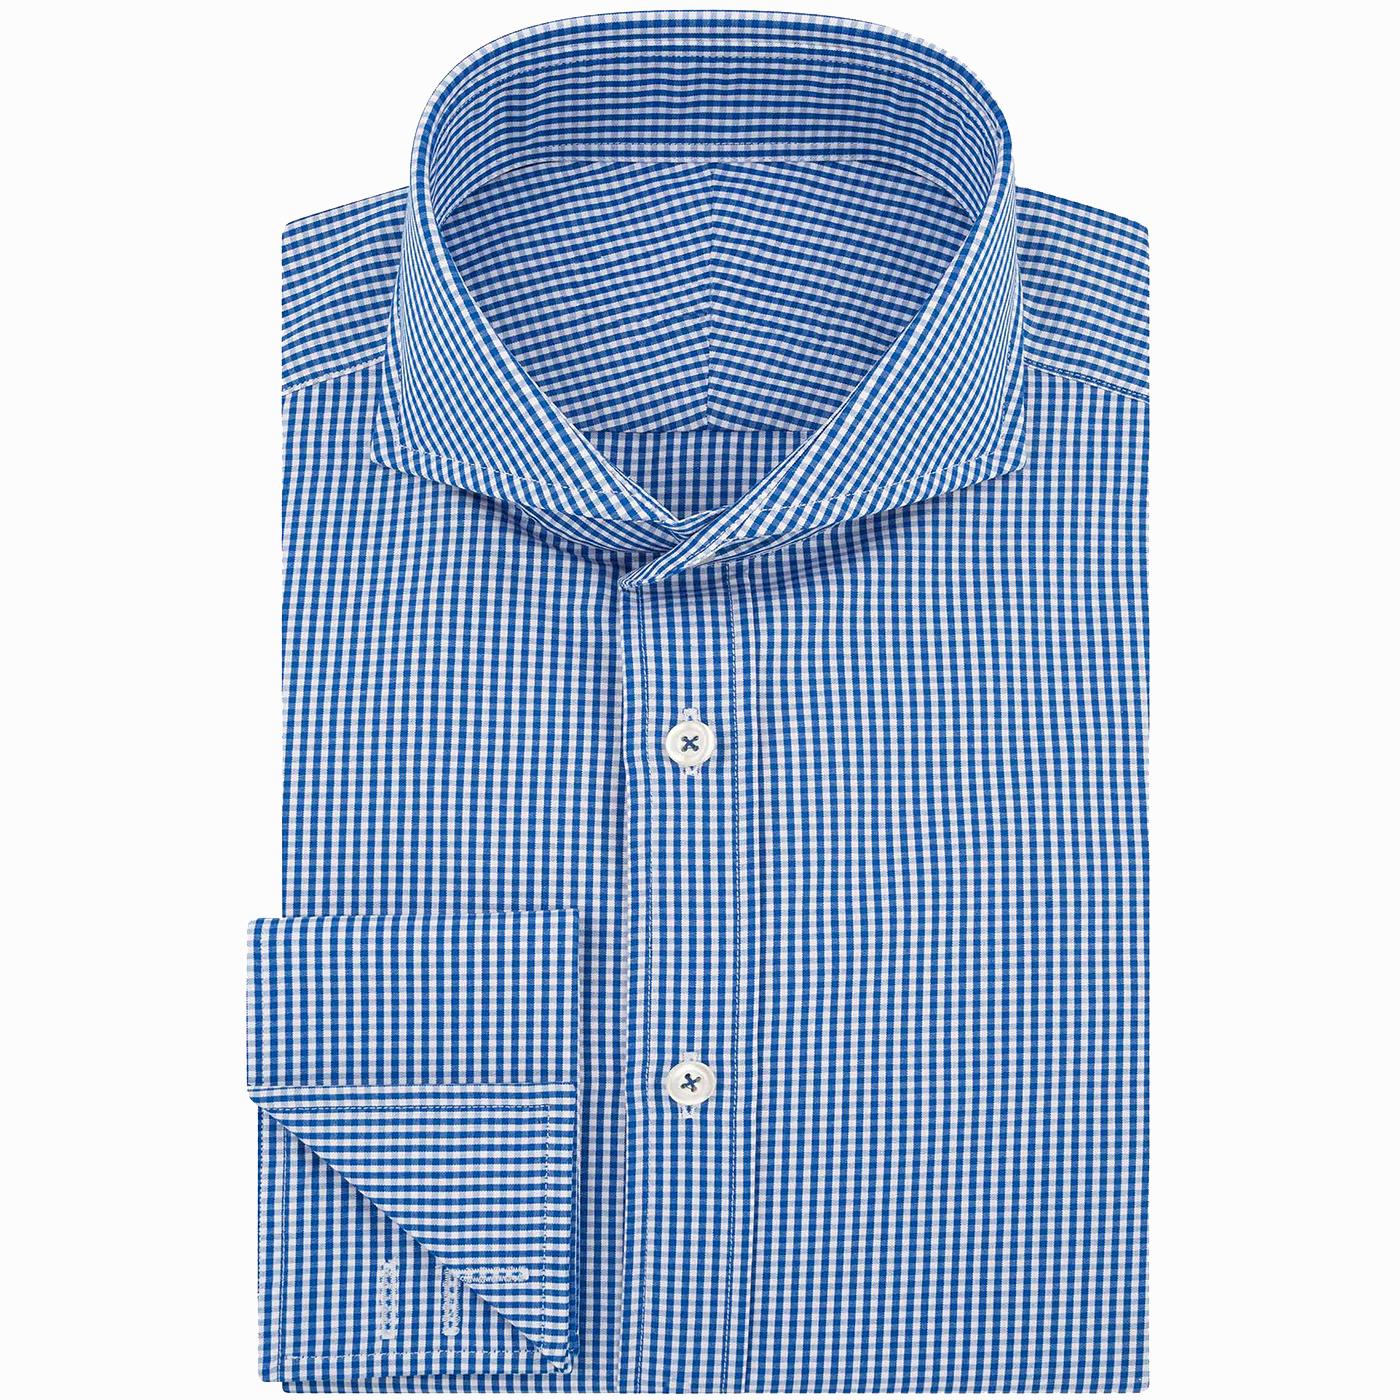 Shirt_25_Windsor-gingham_blue copy.jpg